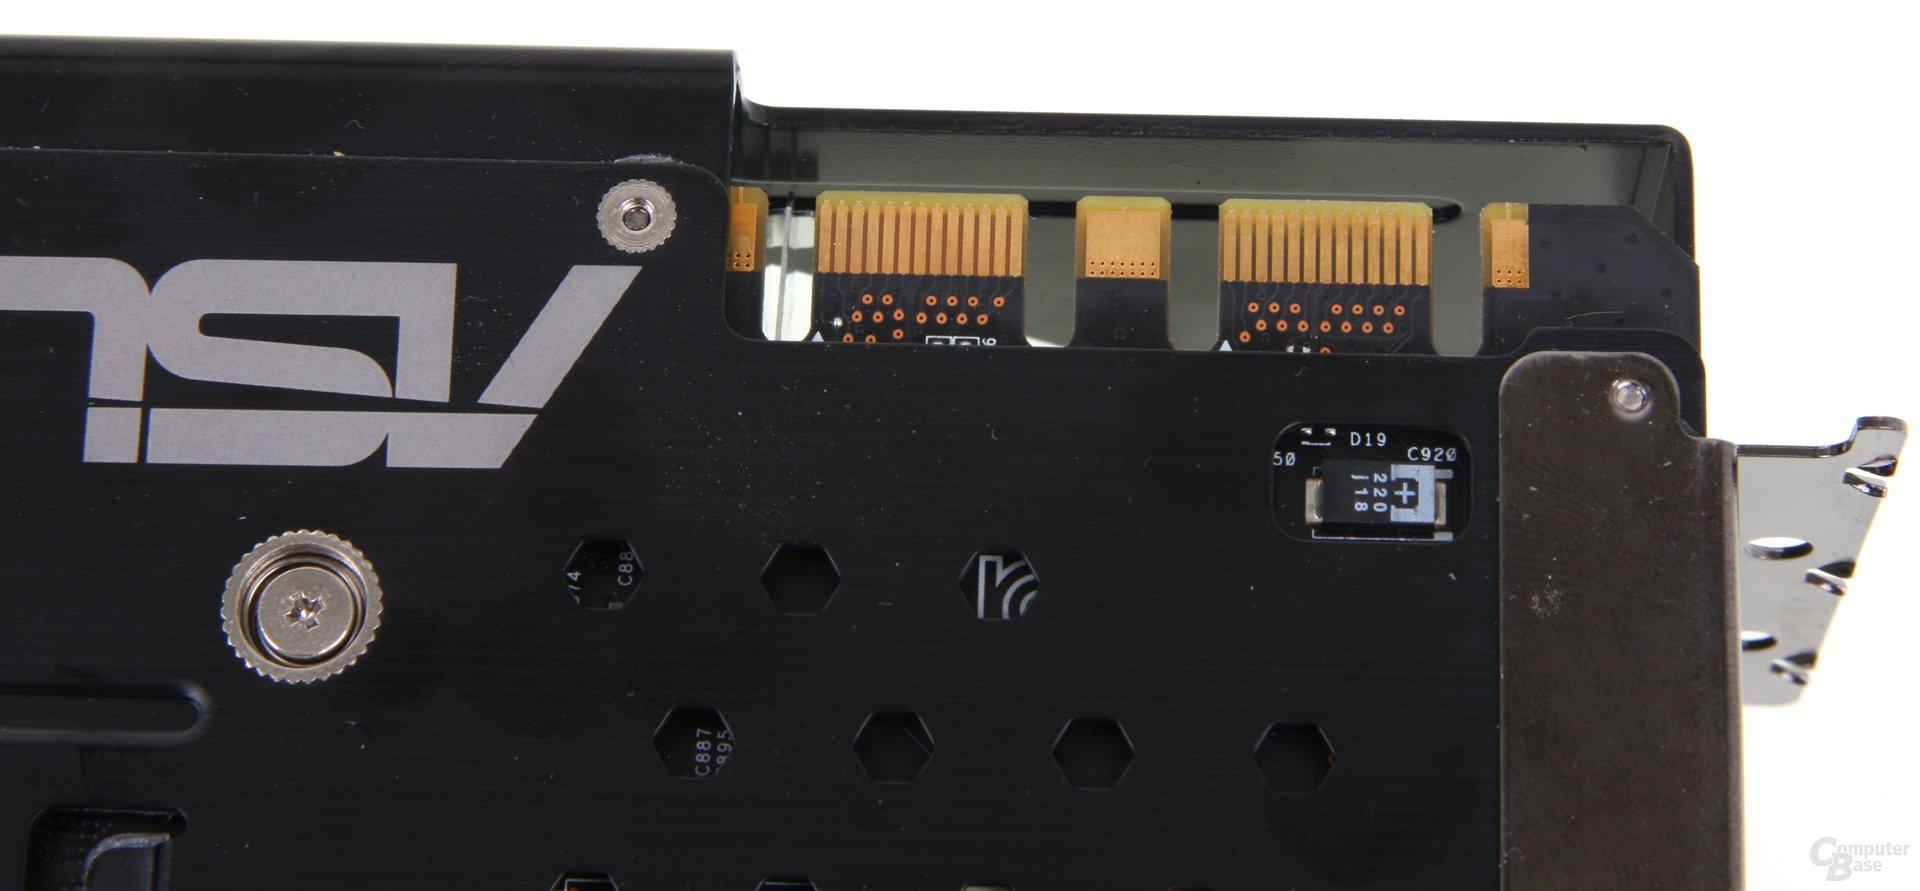 GeForce GTX 680 DCII OC SLI-Anschlüsse